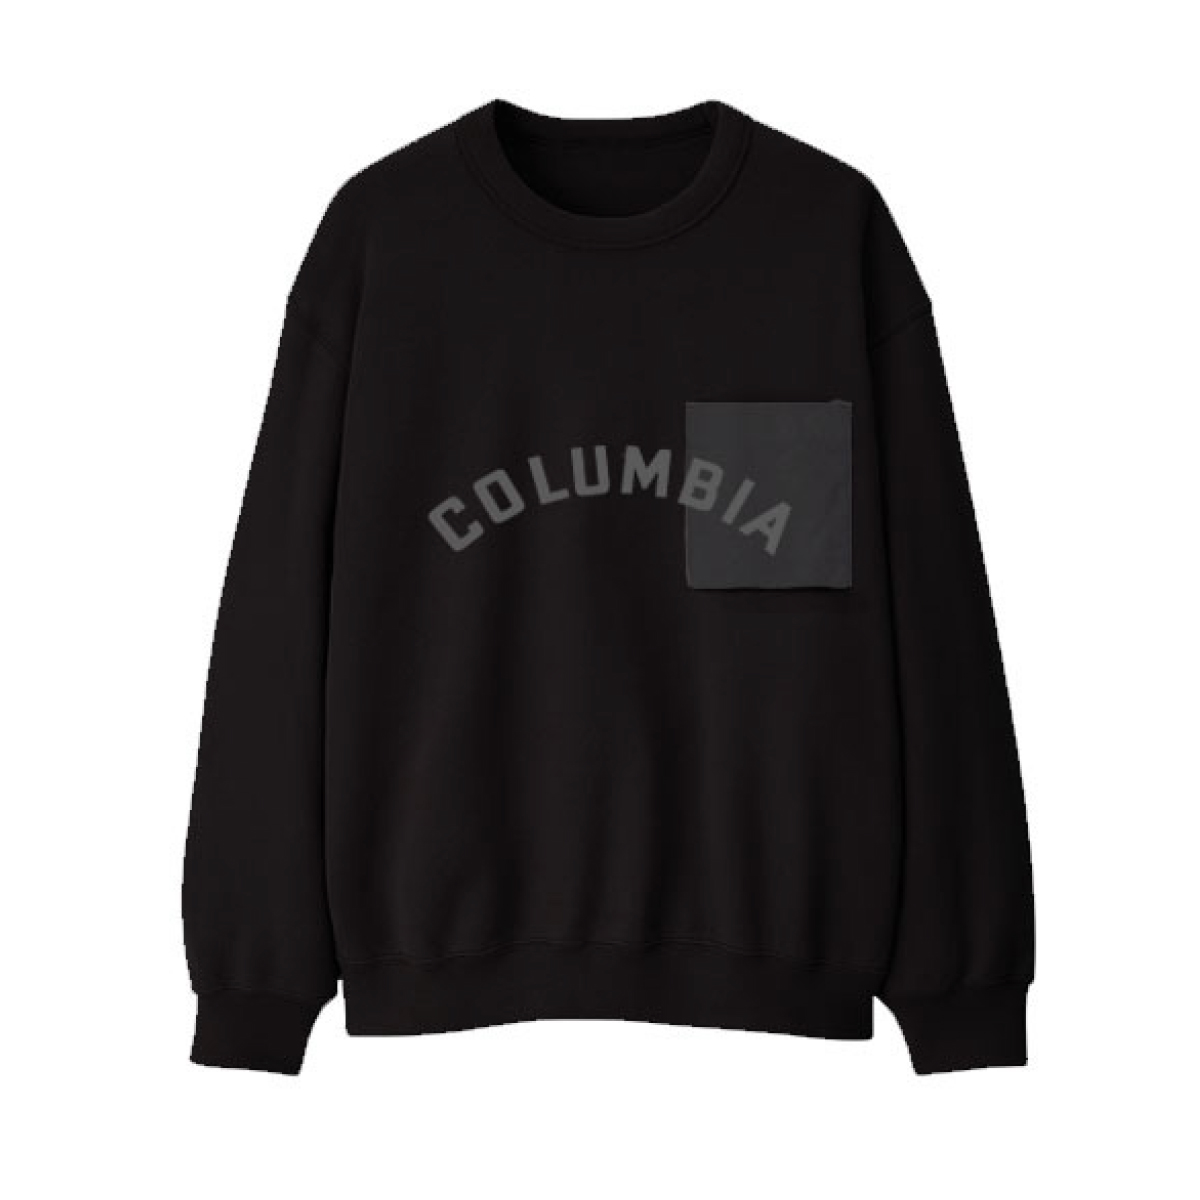 Columbia Records Black Patch Crewneck